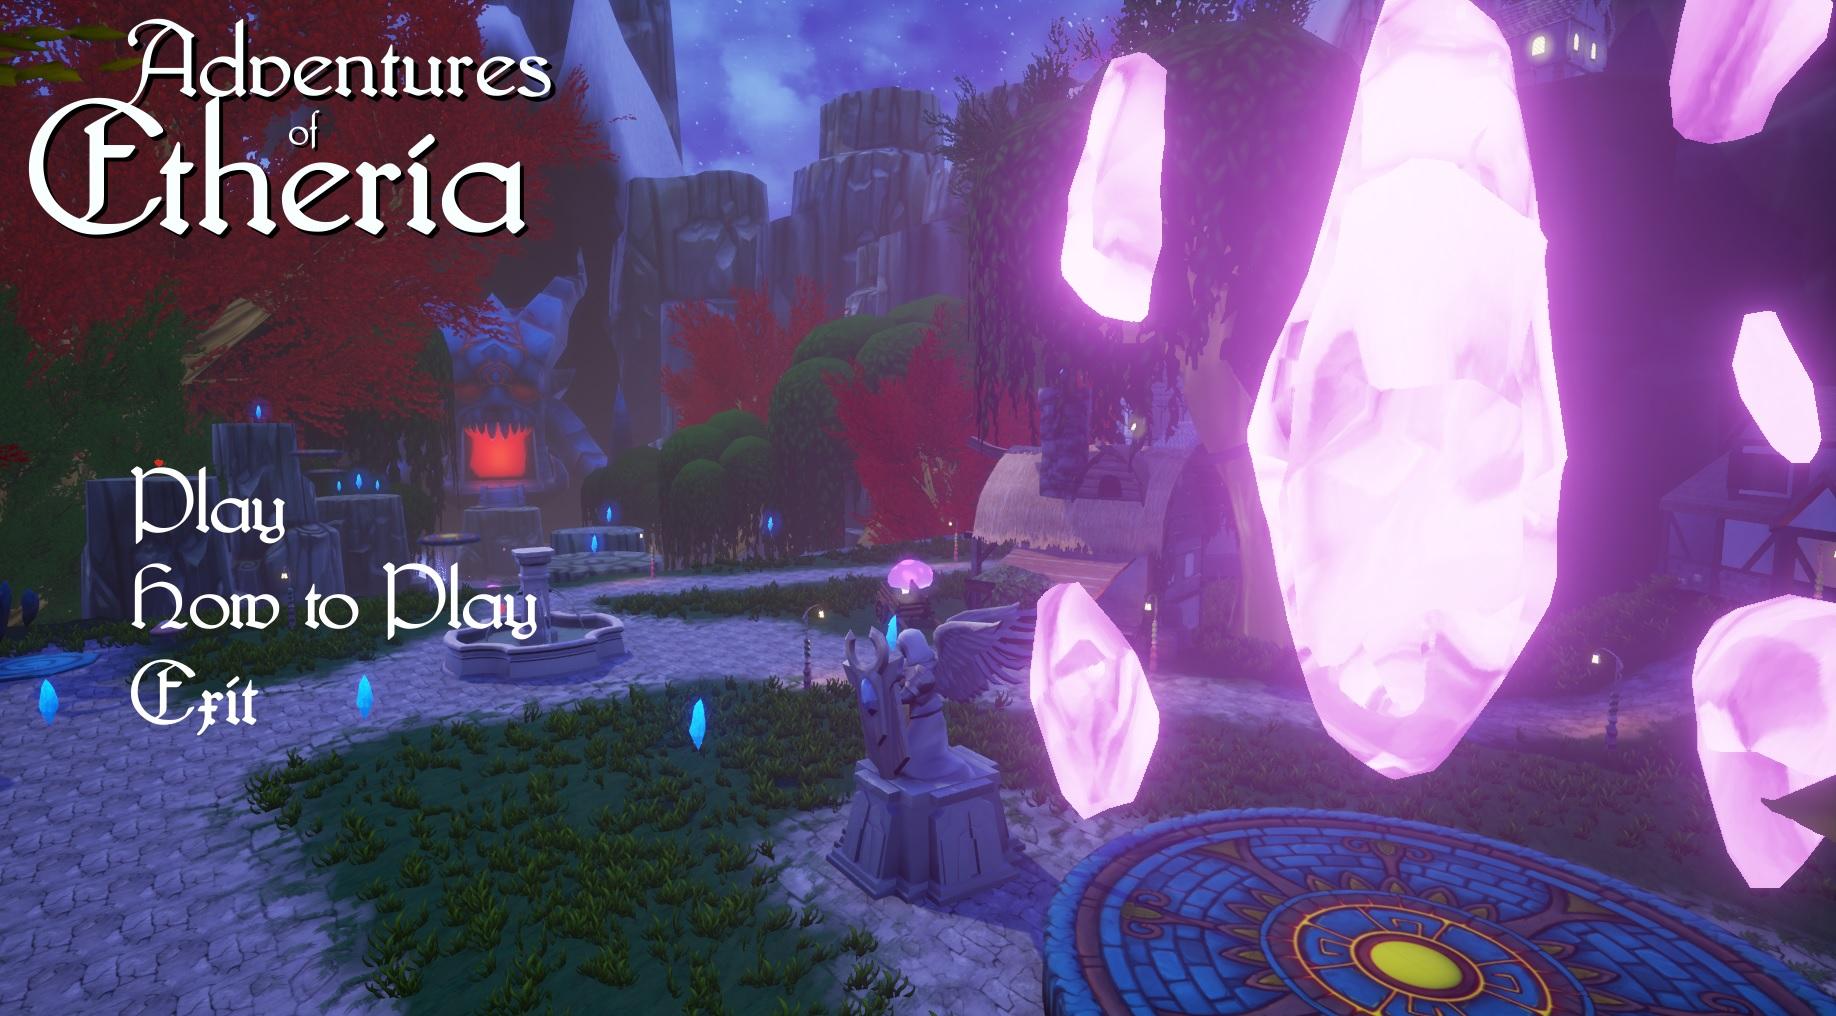 Adventures of Etheria